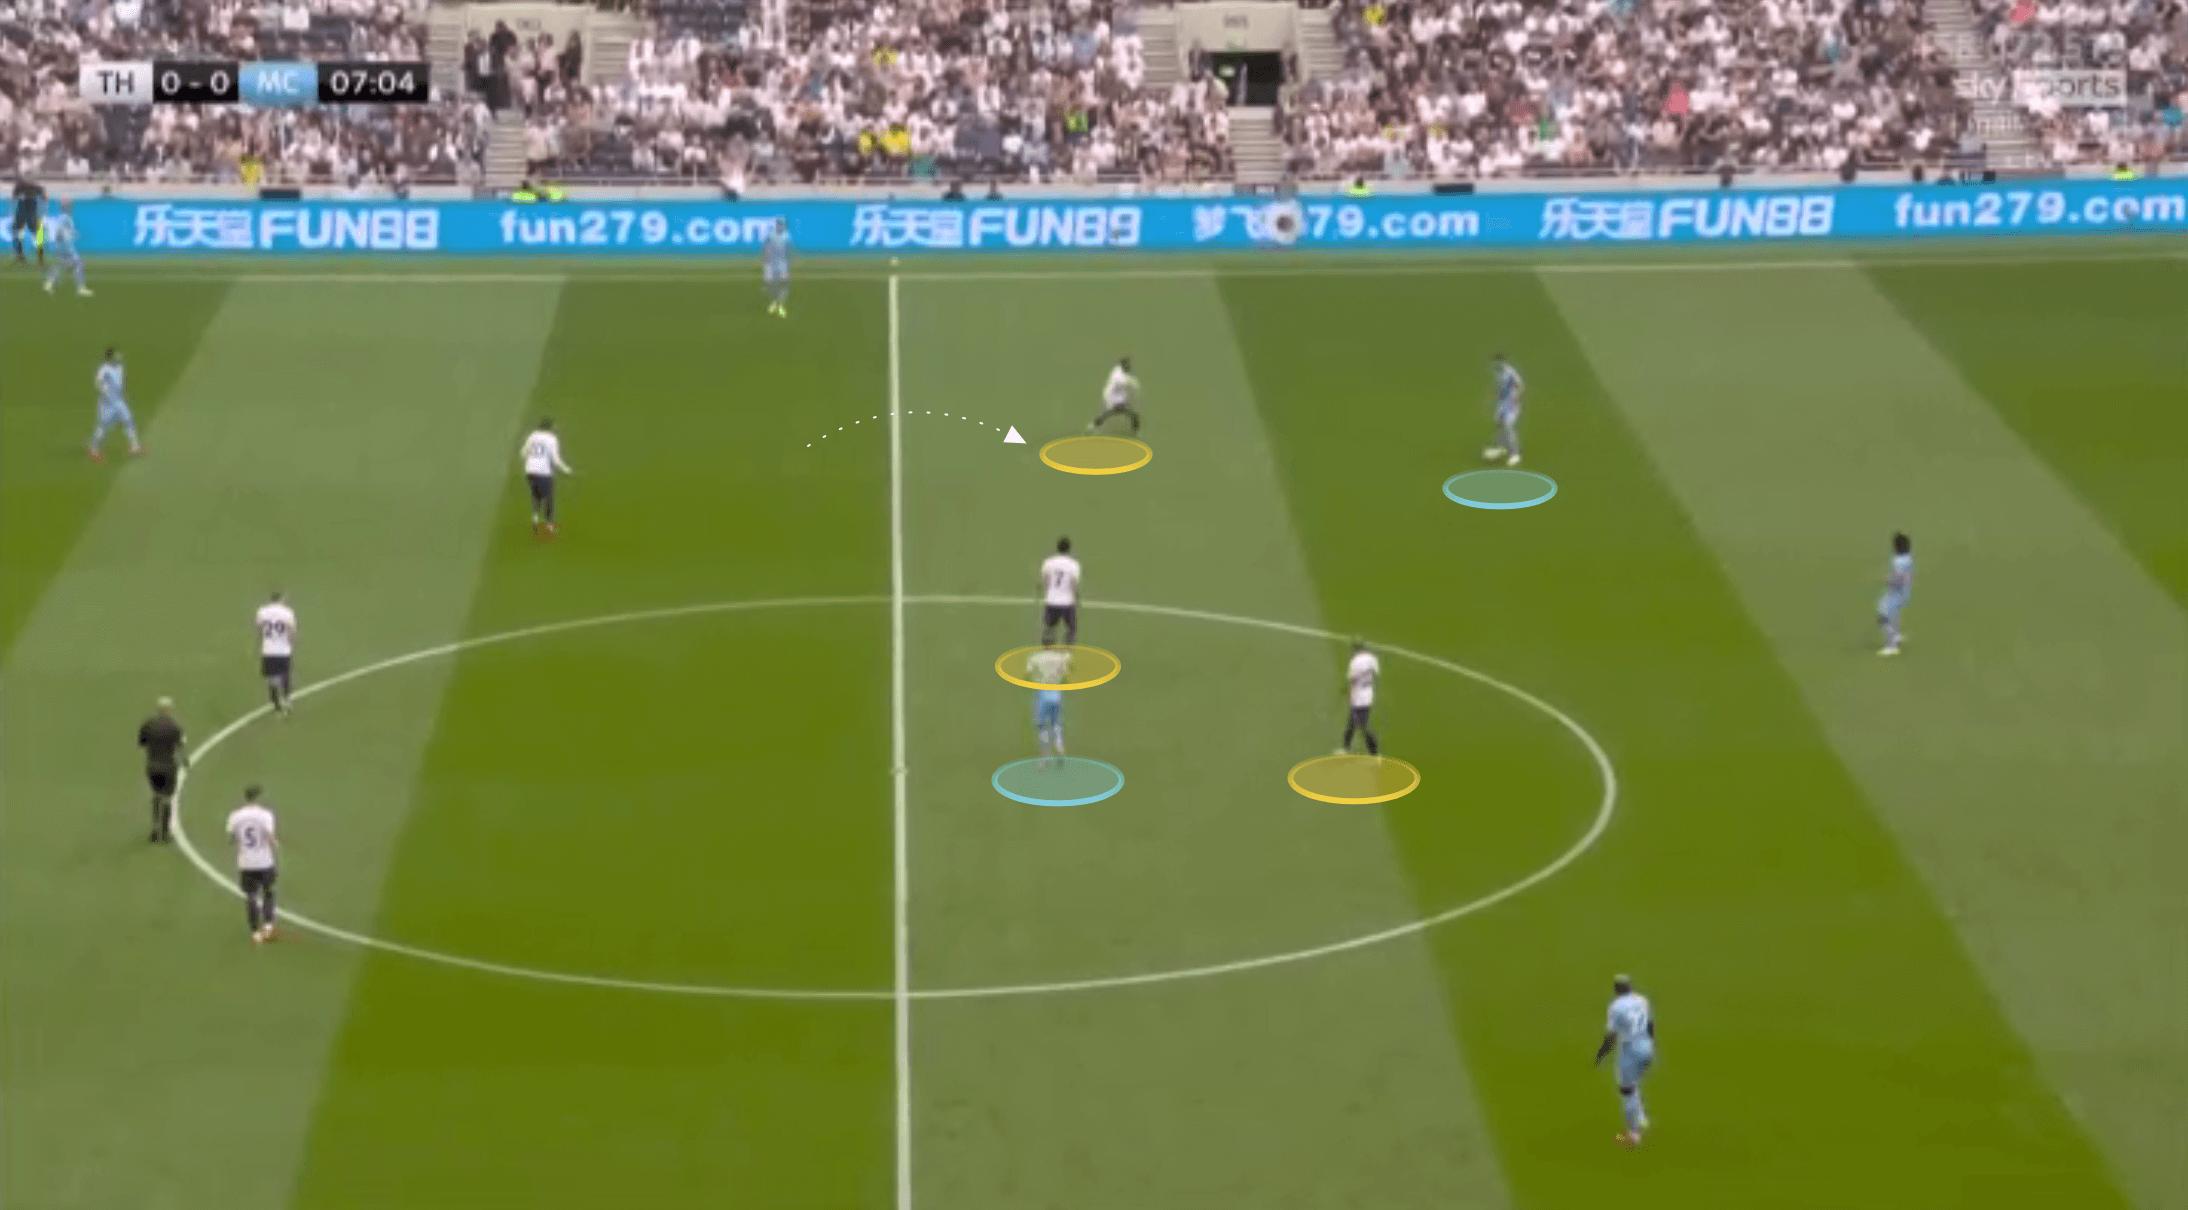 EPL 2021: Tottenham vs Man City - tactical analysis tactics